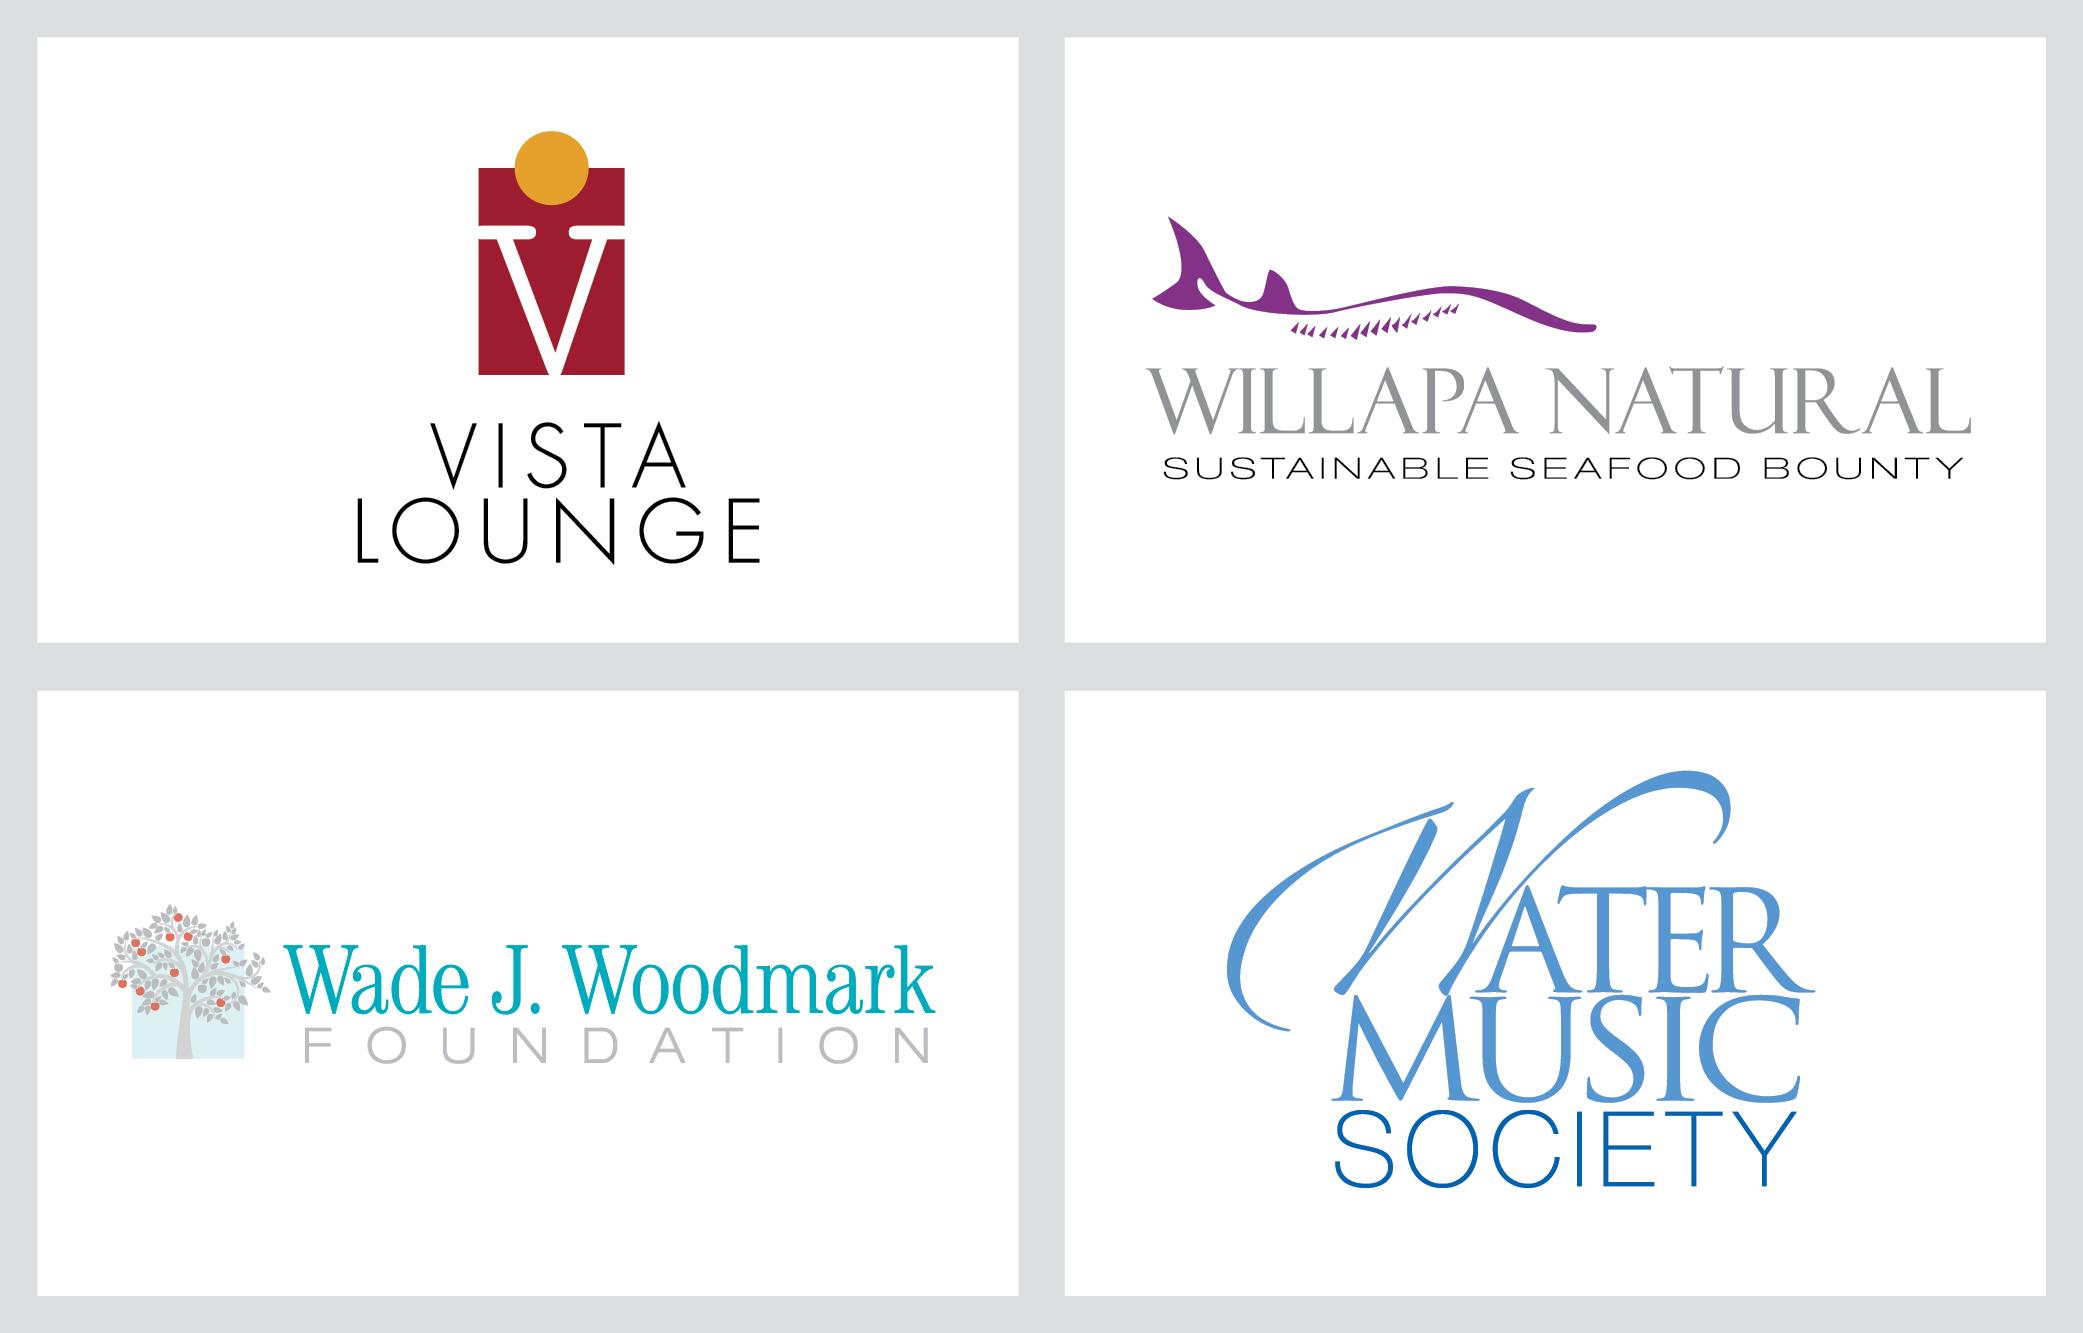 vista lounge, willapa natural, wade j woodmark, water music society logos